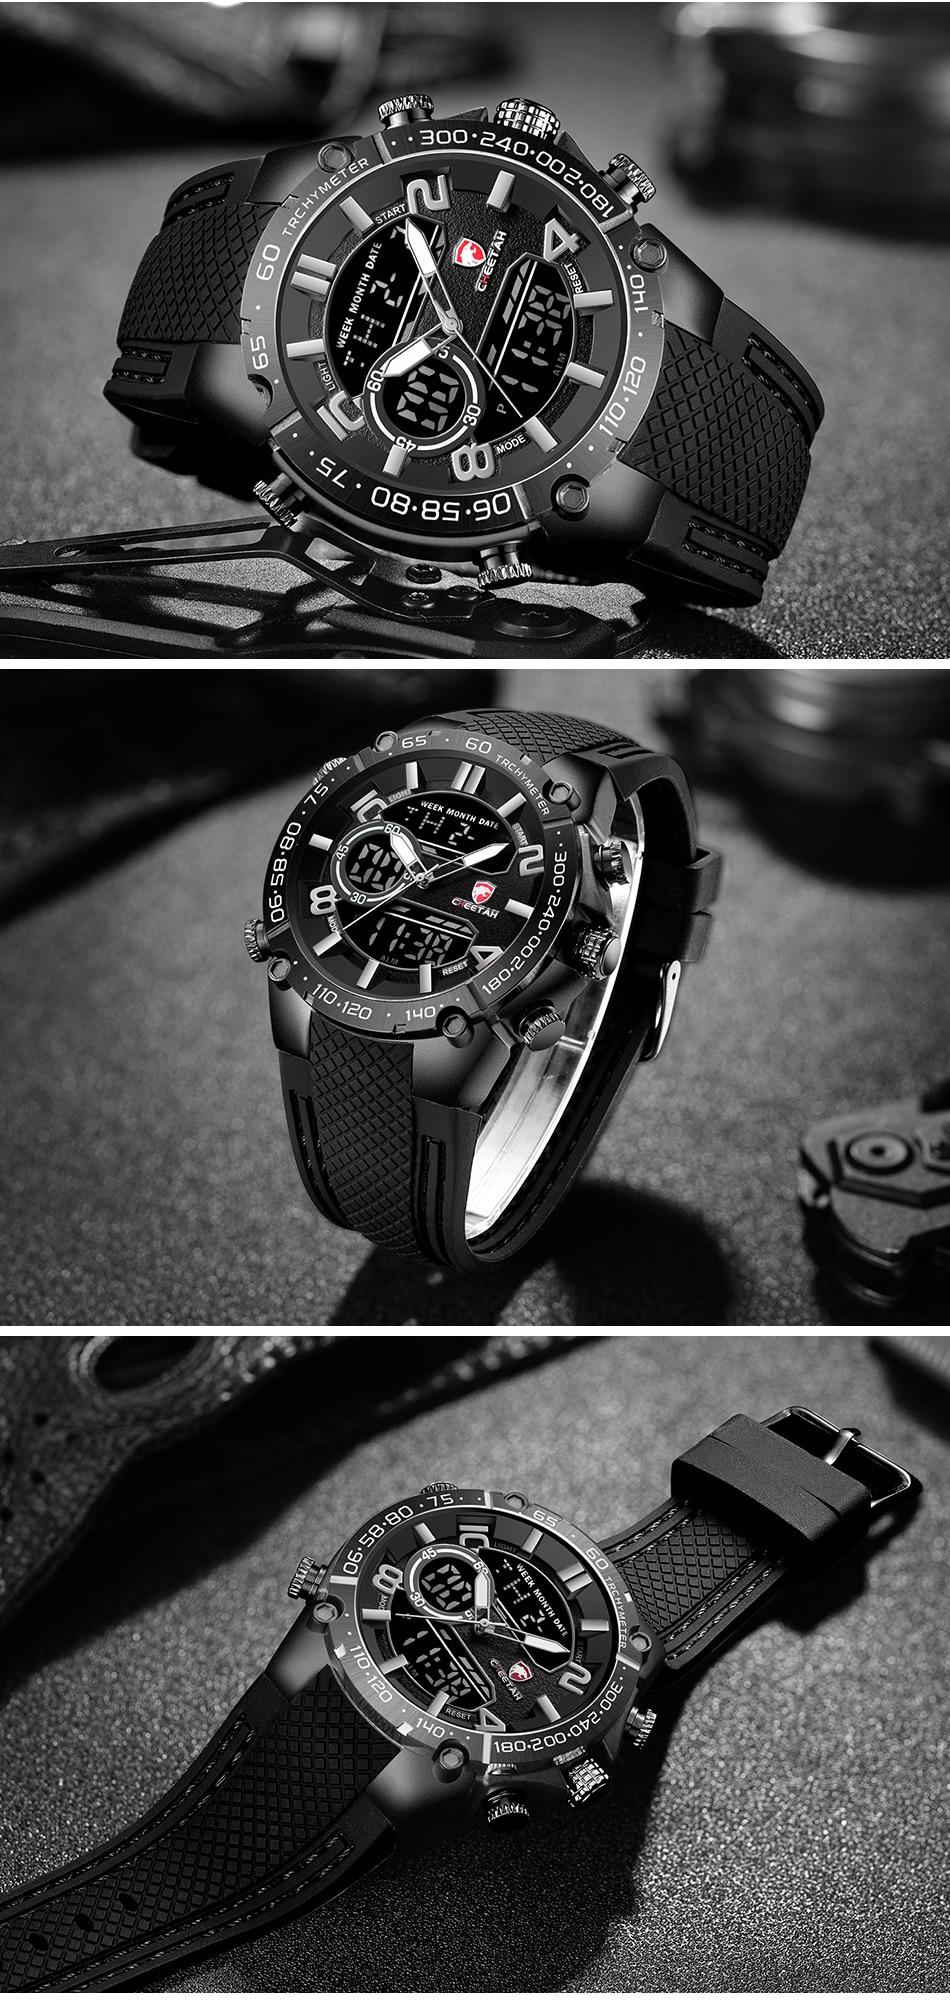 Hc15b1ce5973e42e791bb2ce9bbc61358R Top Luxury Brand CHEETAH Men Watch Fashion Sports Wristwatch Digital Quartz Analog Clock Waterproof Watch Men Relogio Masculino